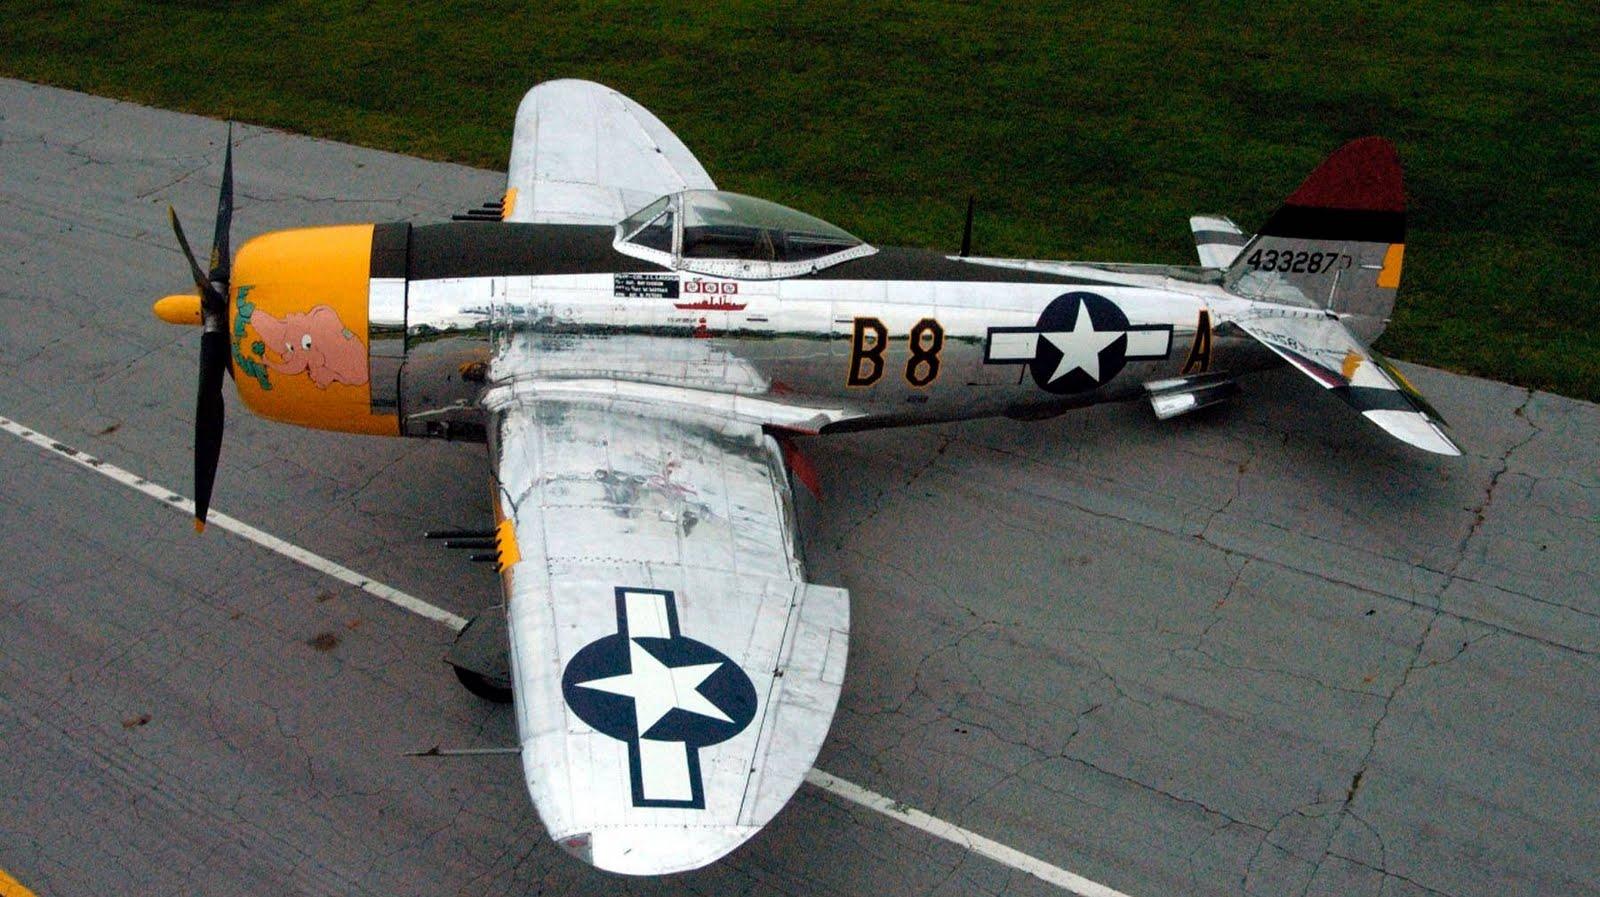 http://1.bp.blogspot.com/-Ah5RLrw5agc/Tff58LbwfcI/AAAAAAAAFqg/SUStogQQXlY/s1600/republic_p-47_thunderbolt_classic_aircraft-wallpaper.jpg